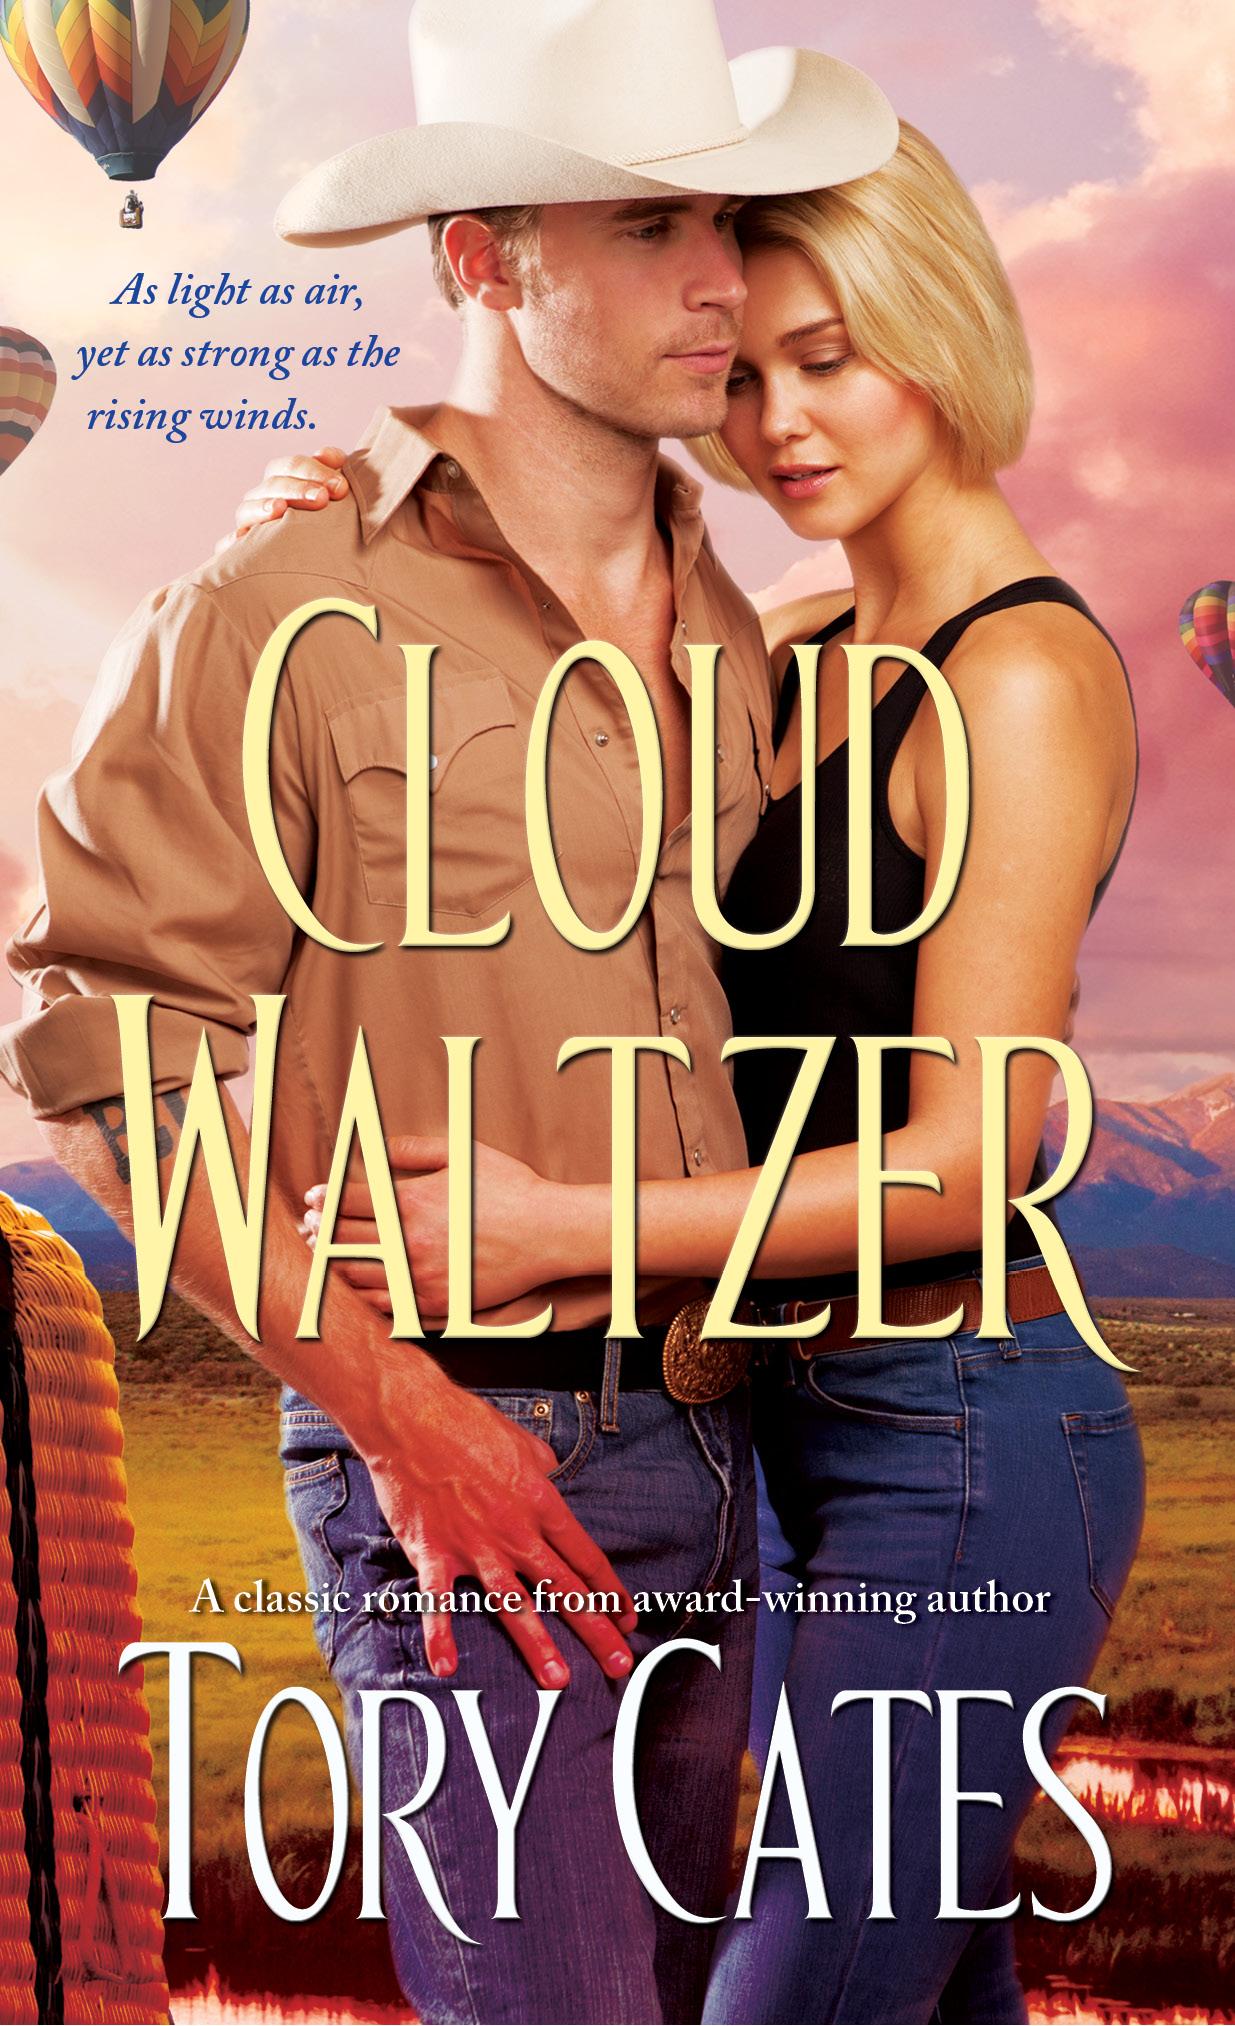 Cloud waltzer 9781476732565 hr